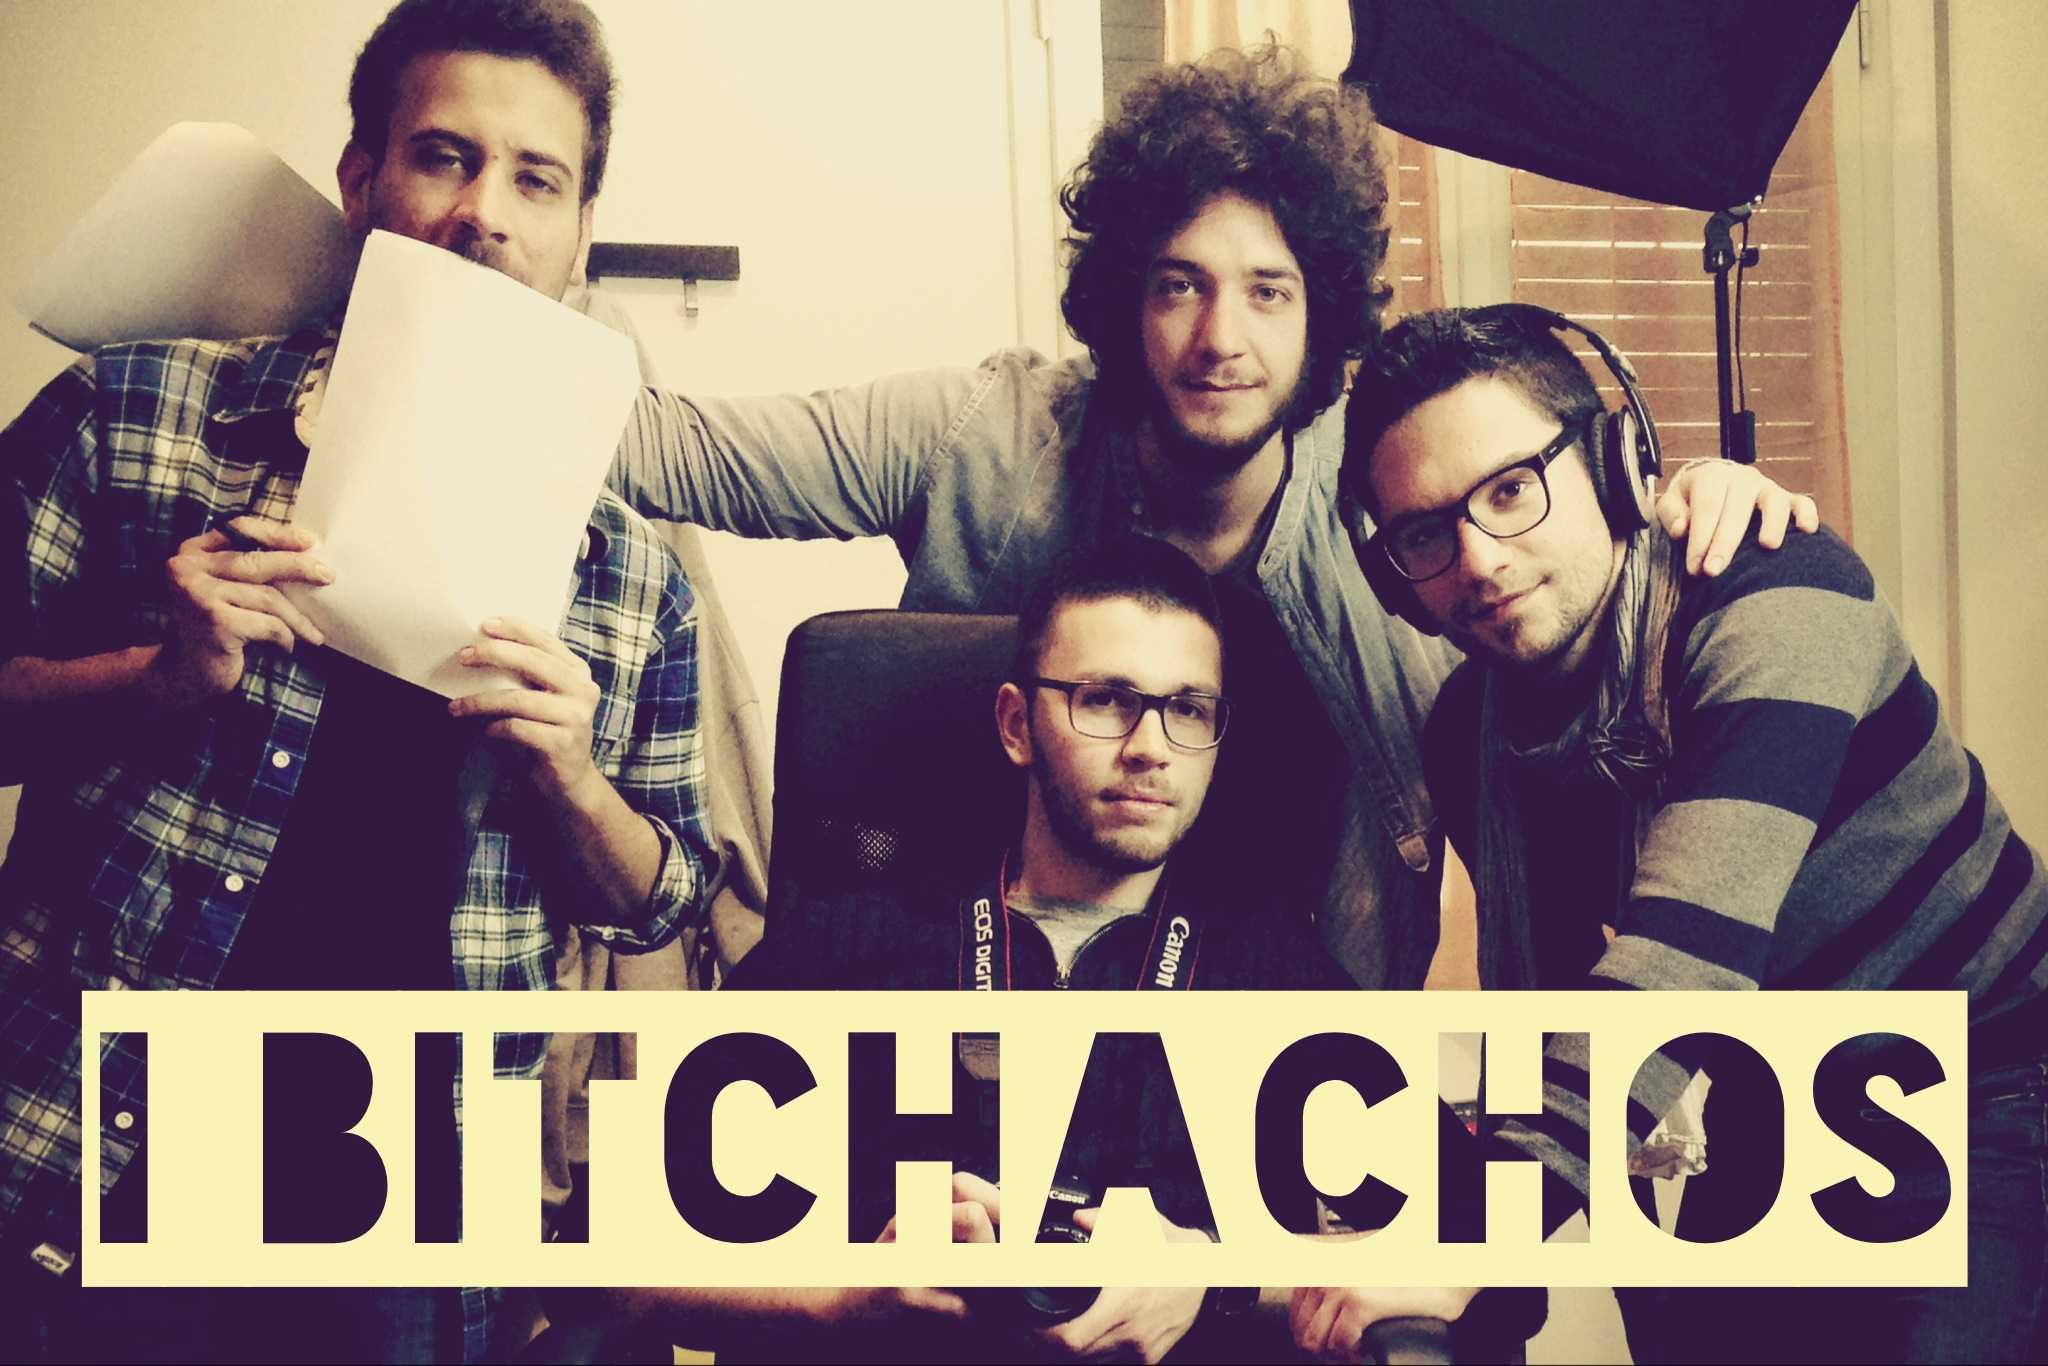 Bitchachos